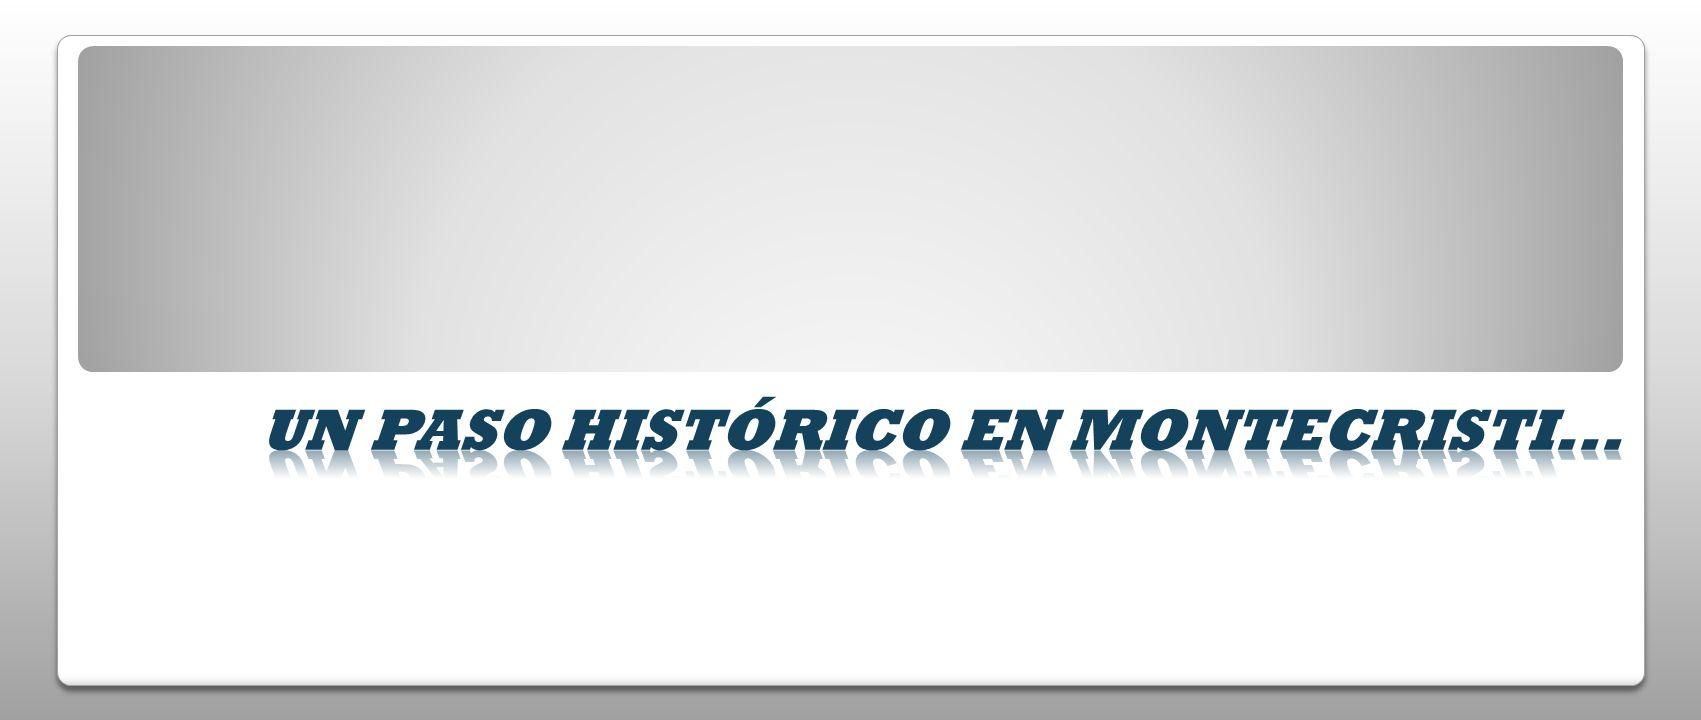 Un paso histórico en montecristi...